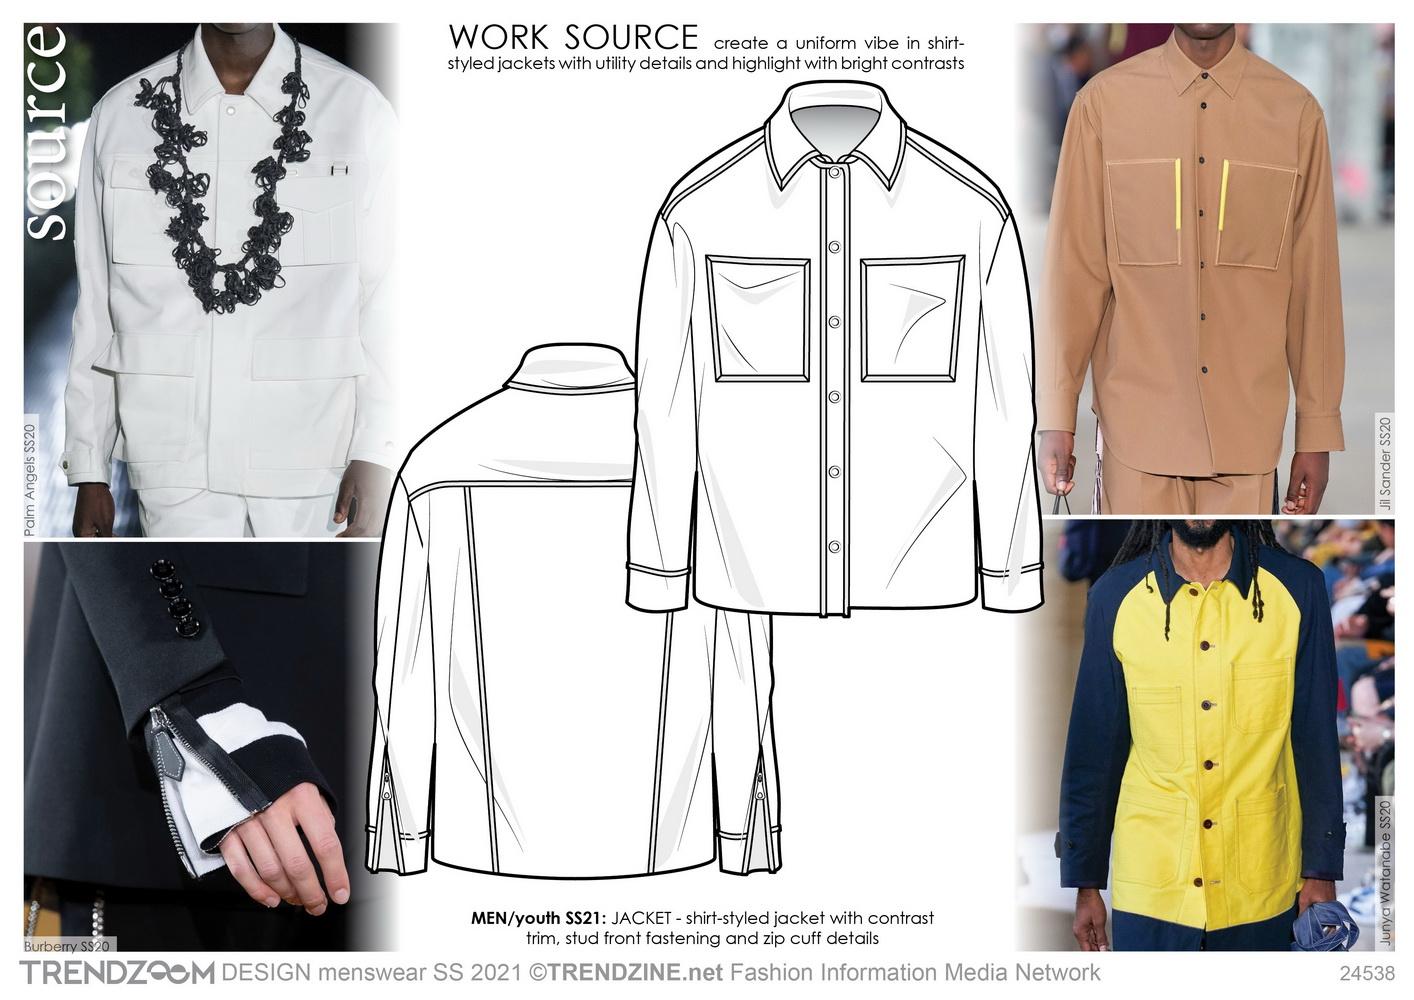 Trendzoom Design Menswear Spring Summer 2021 Trends 1233506